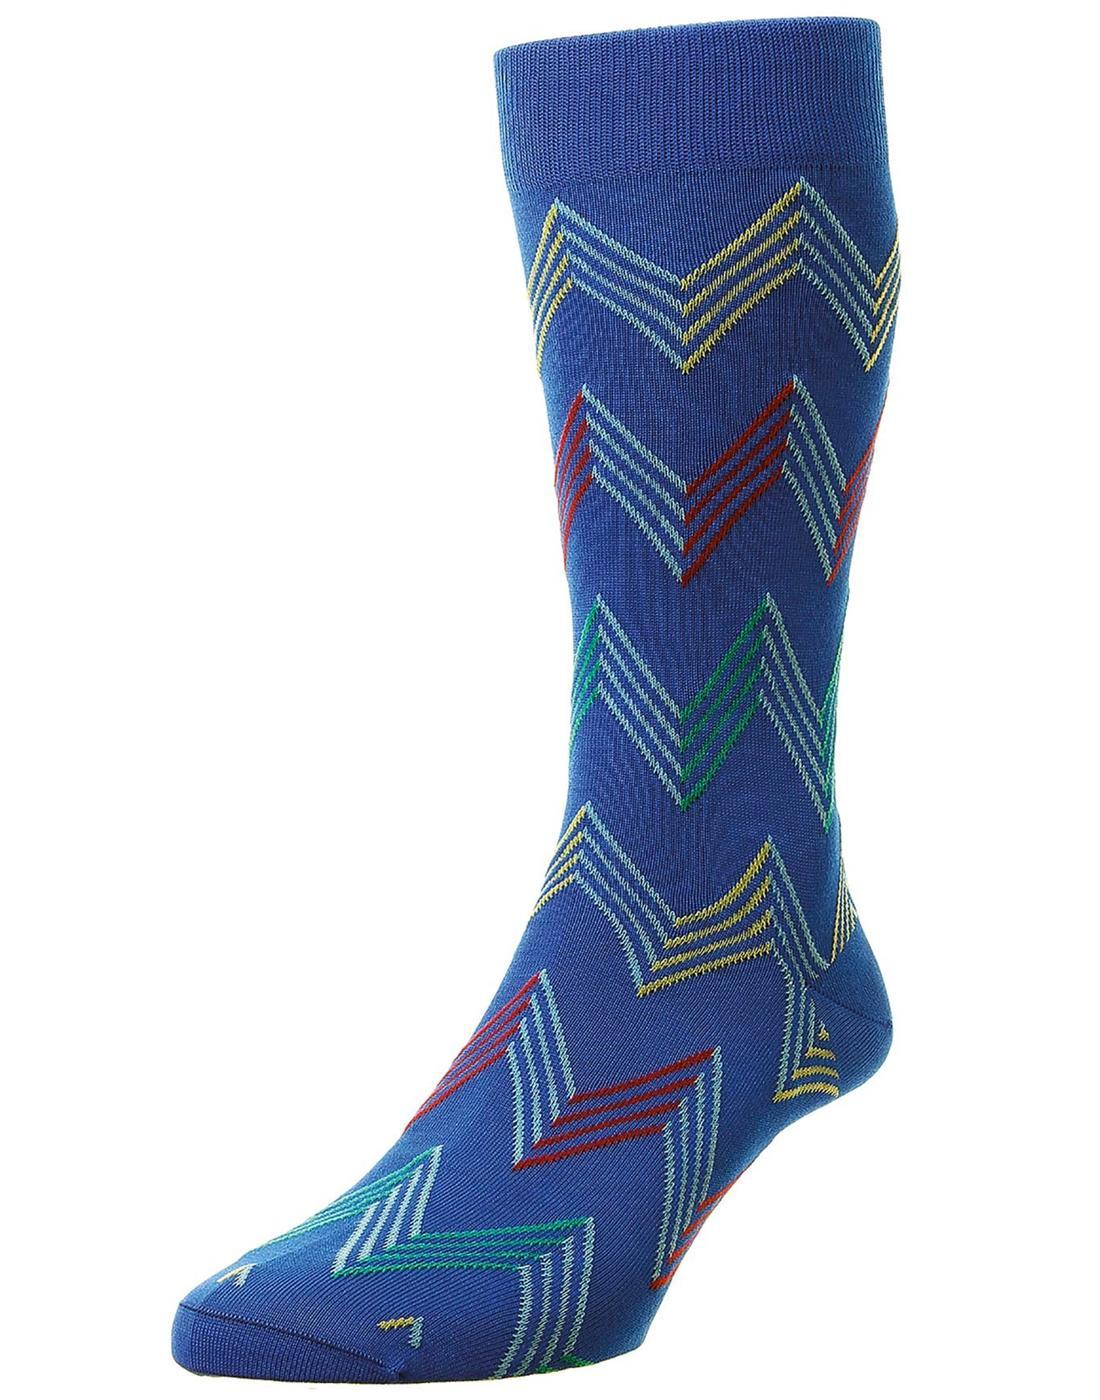 + Yasawa PANTHERELLA Men's Mod Zig Zag Socks B